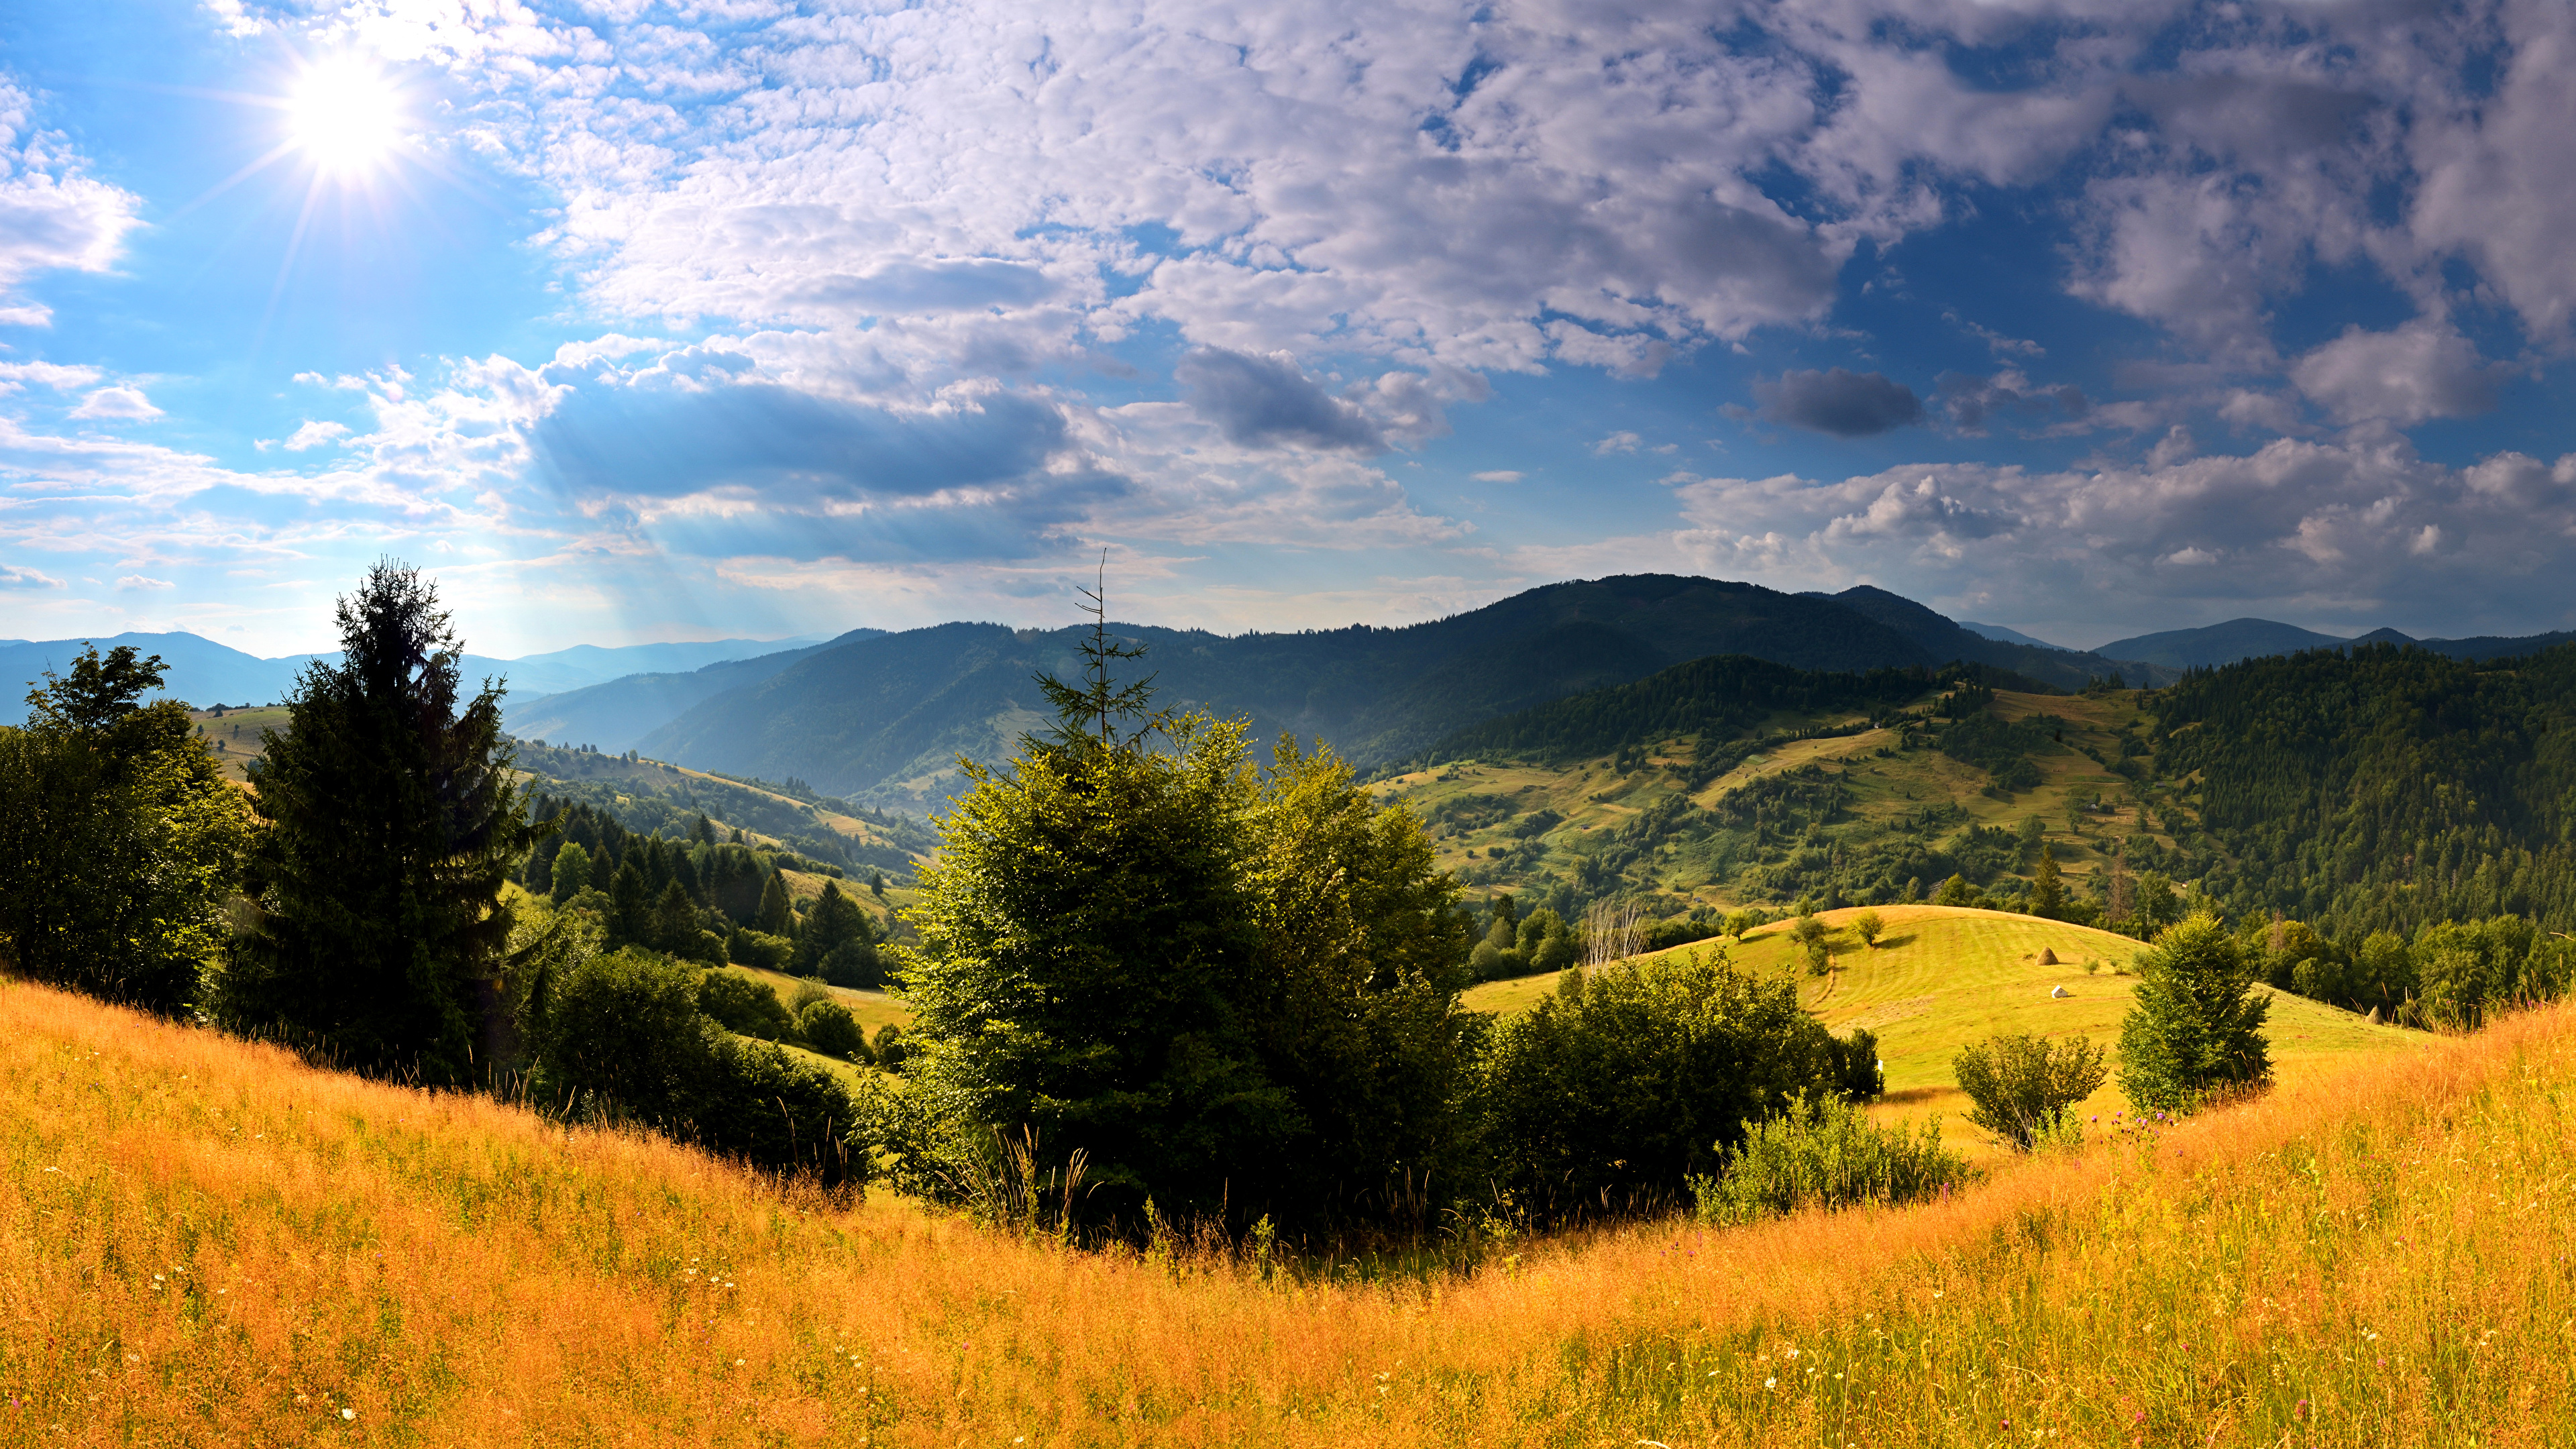 Картинка Карпаты Украина Ель Горы Природа Пейзаж Трава Облака 3840x2160 ели гора траве облако облачно